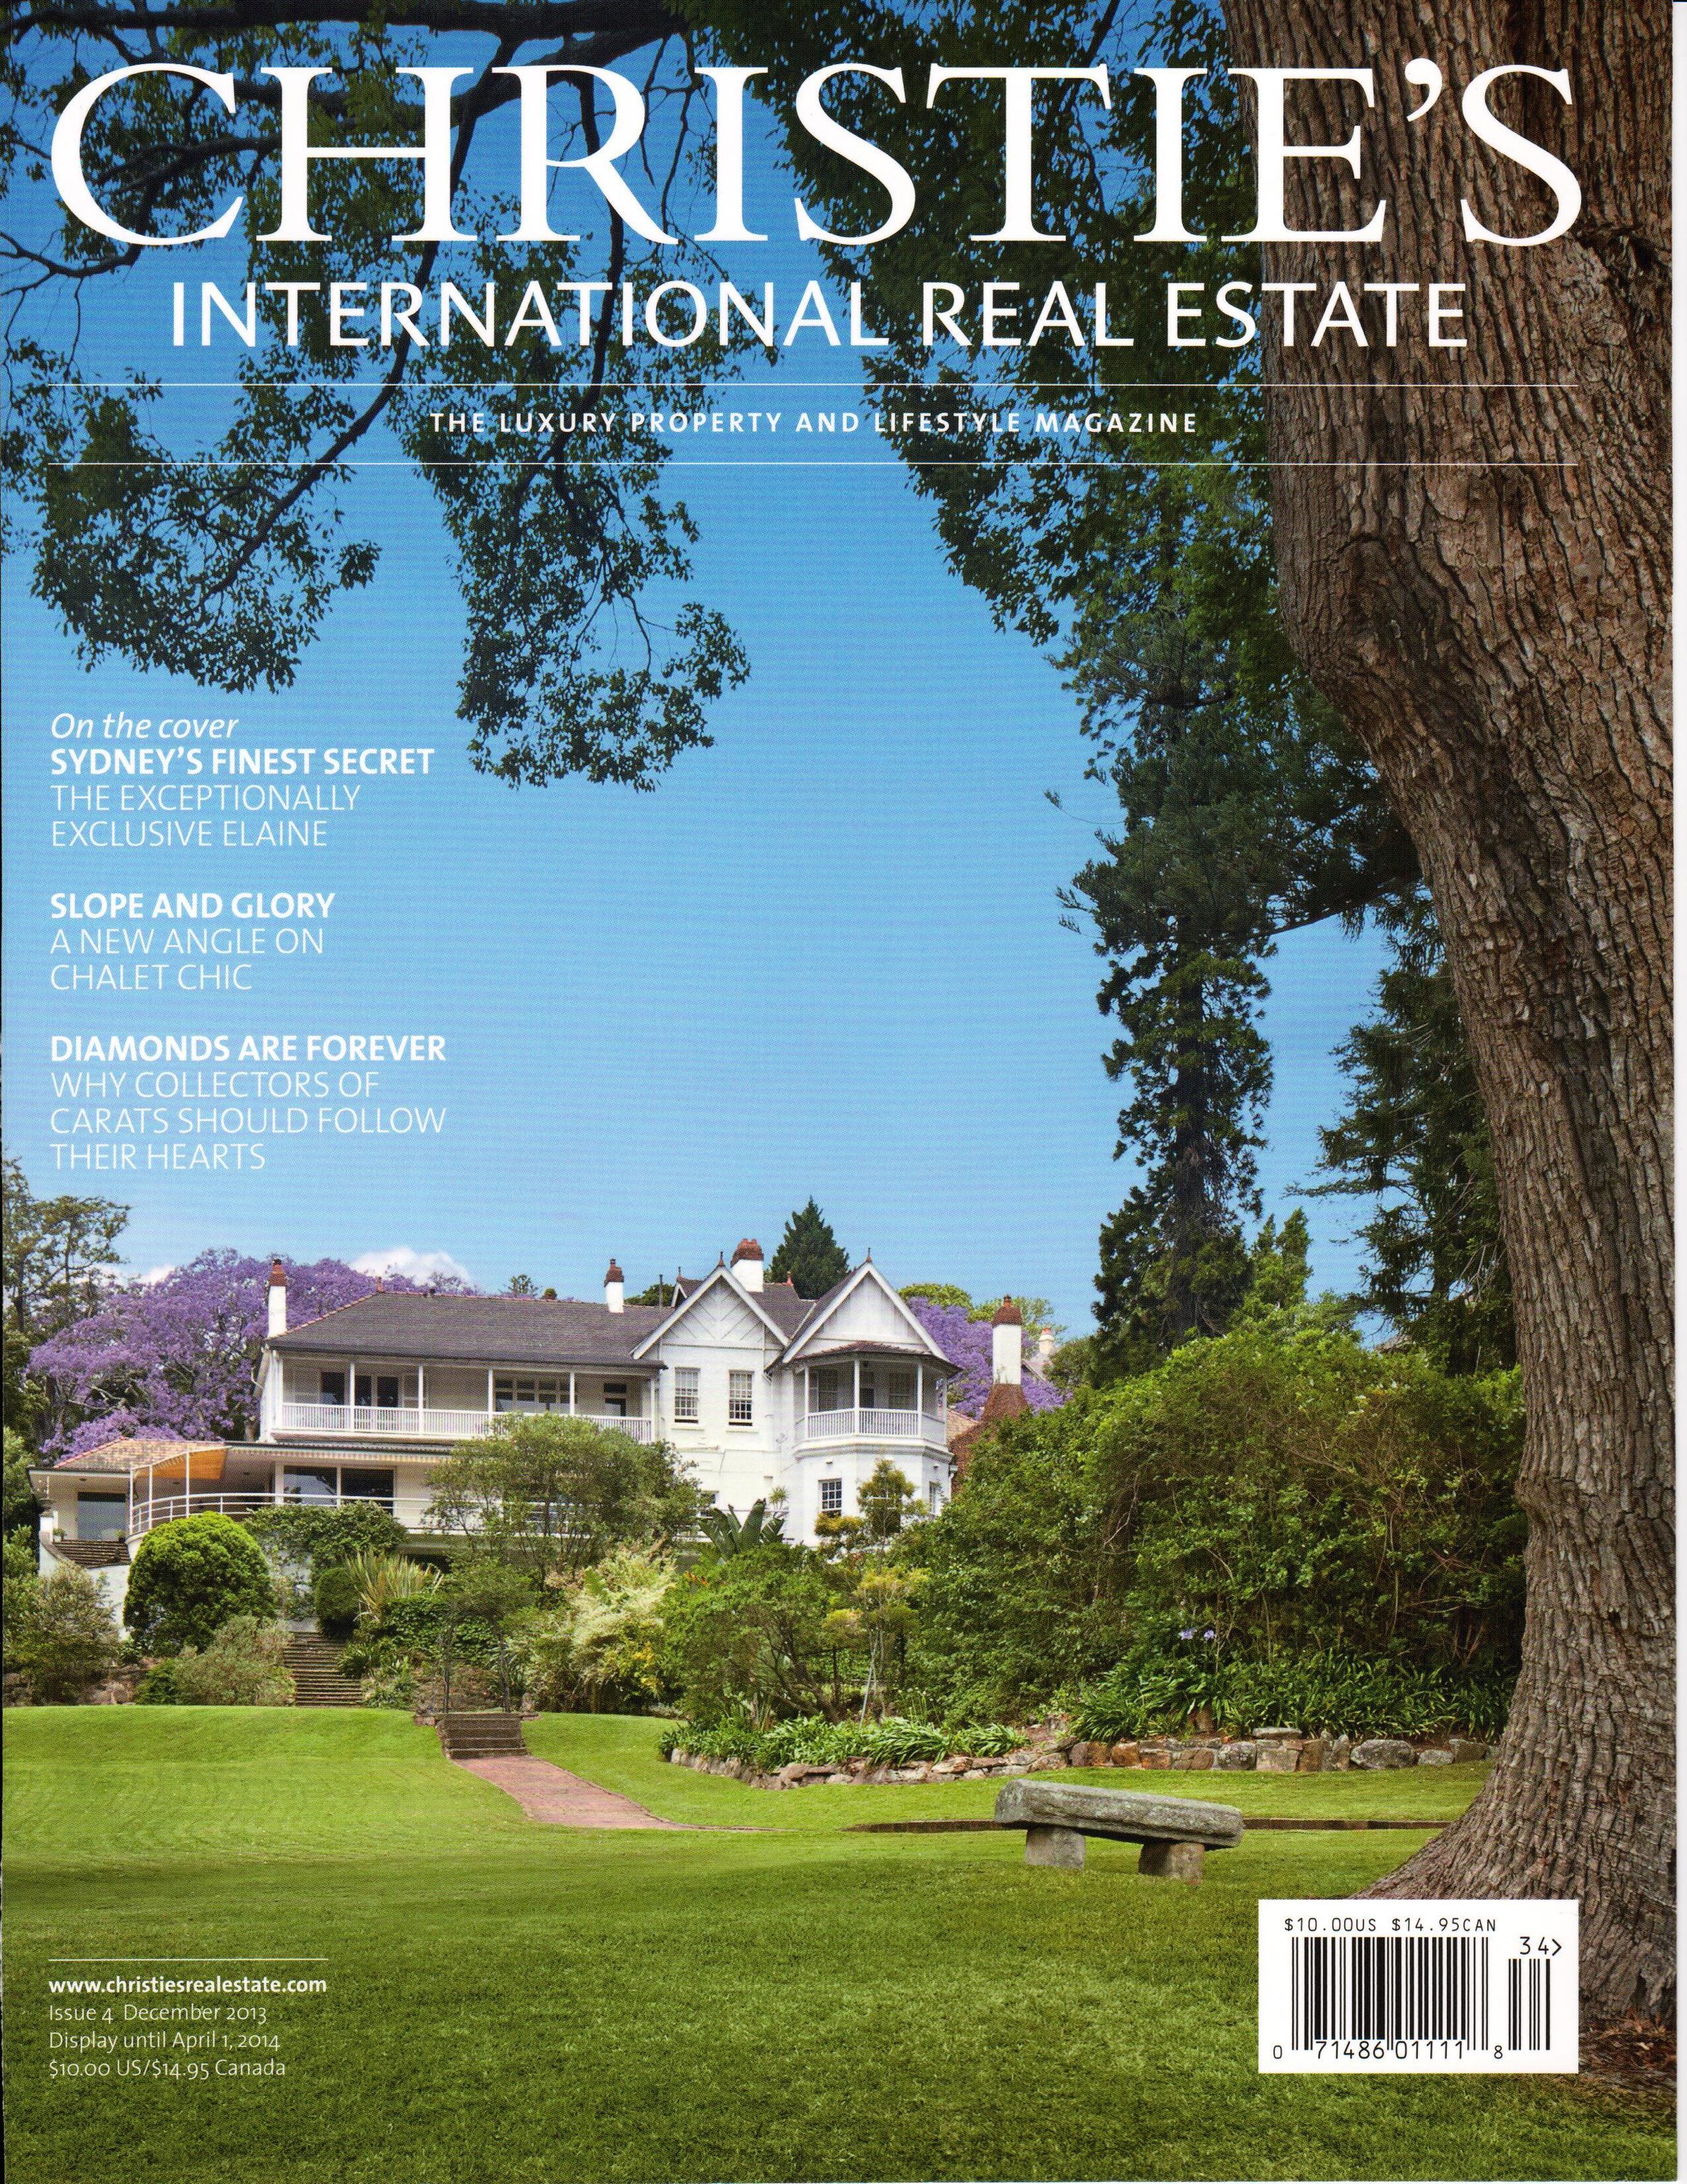 Christie's Real Estate 2013 cover.jpg